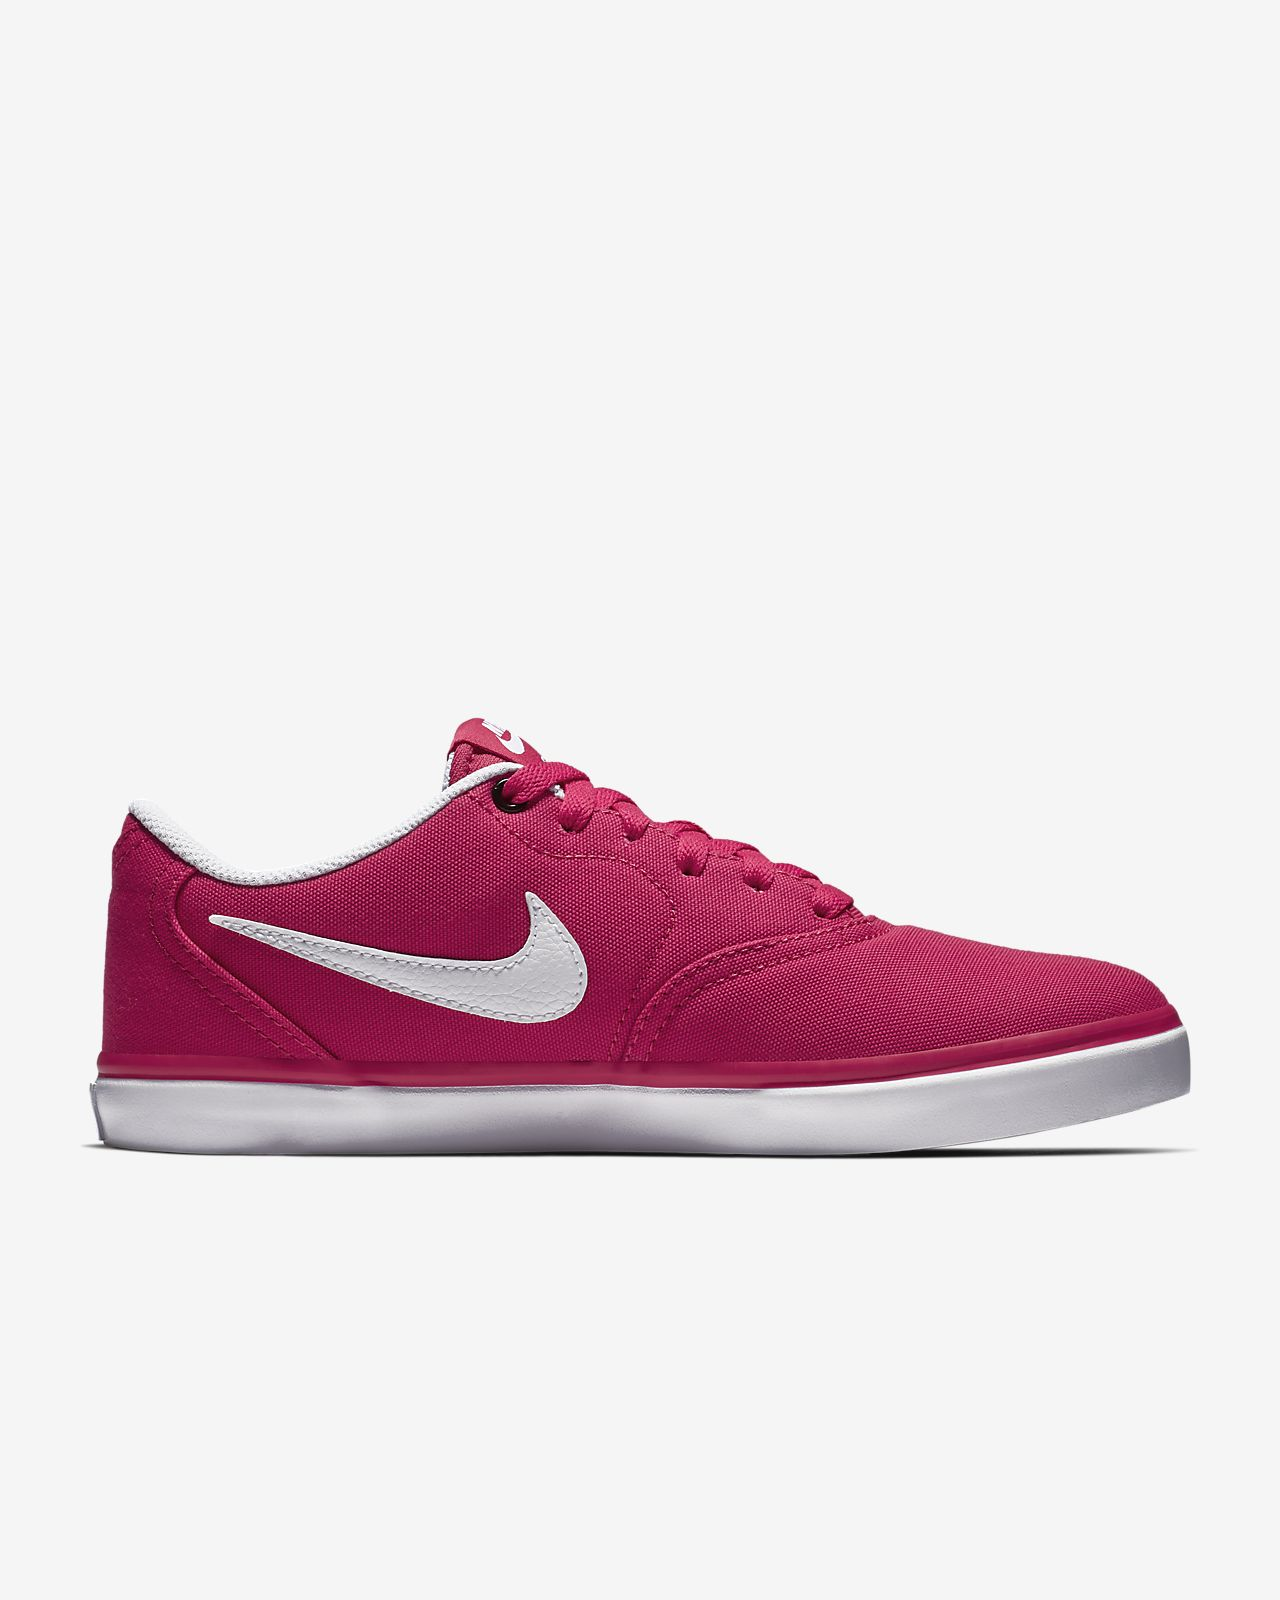 5a27681f87af Nike SB Check Solarsoft Canvas Women s Skateboarding Shoe. Nike.com GB